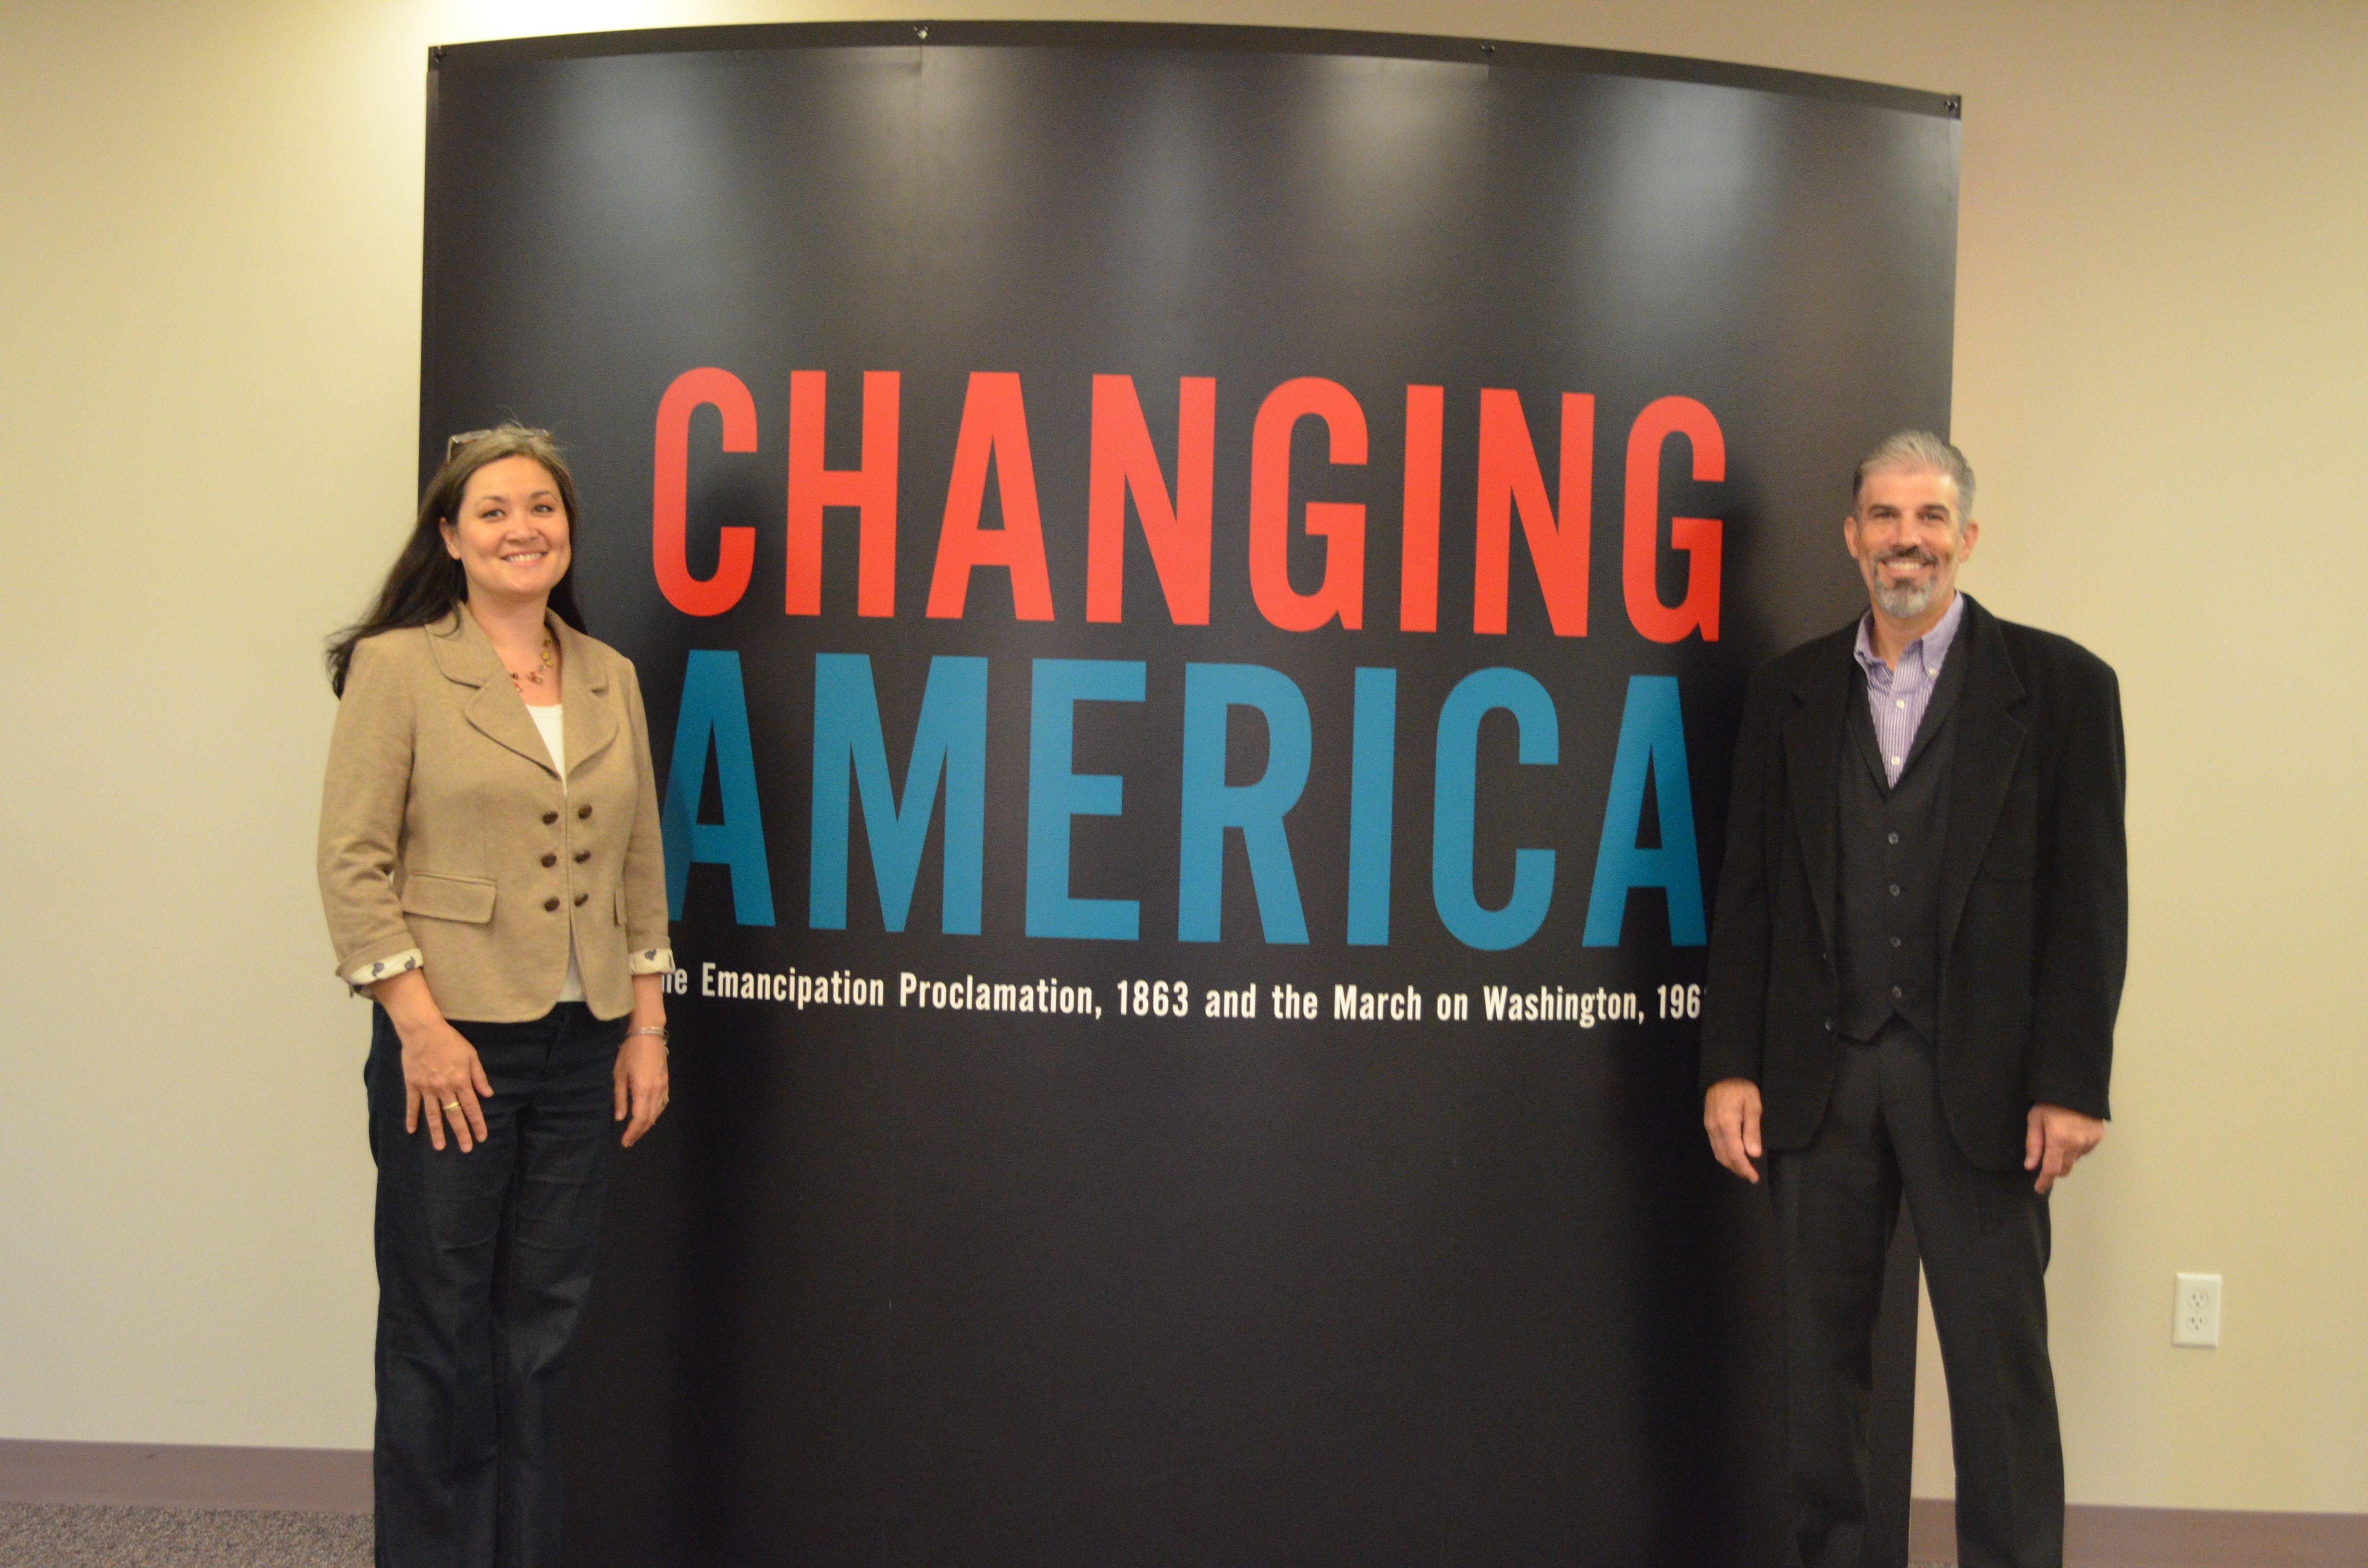 Dr Matt Warshauer And Wanda Warshauer At Changing America Exhibit Series Opening Day Saturday November 1 2014 Avon Public Libr America Exhibition Change